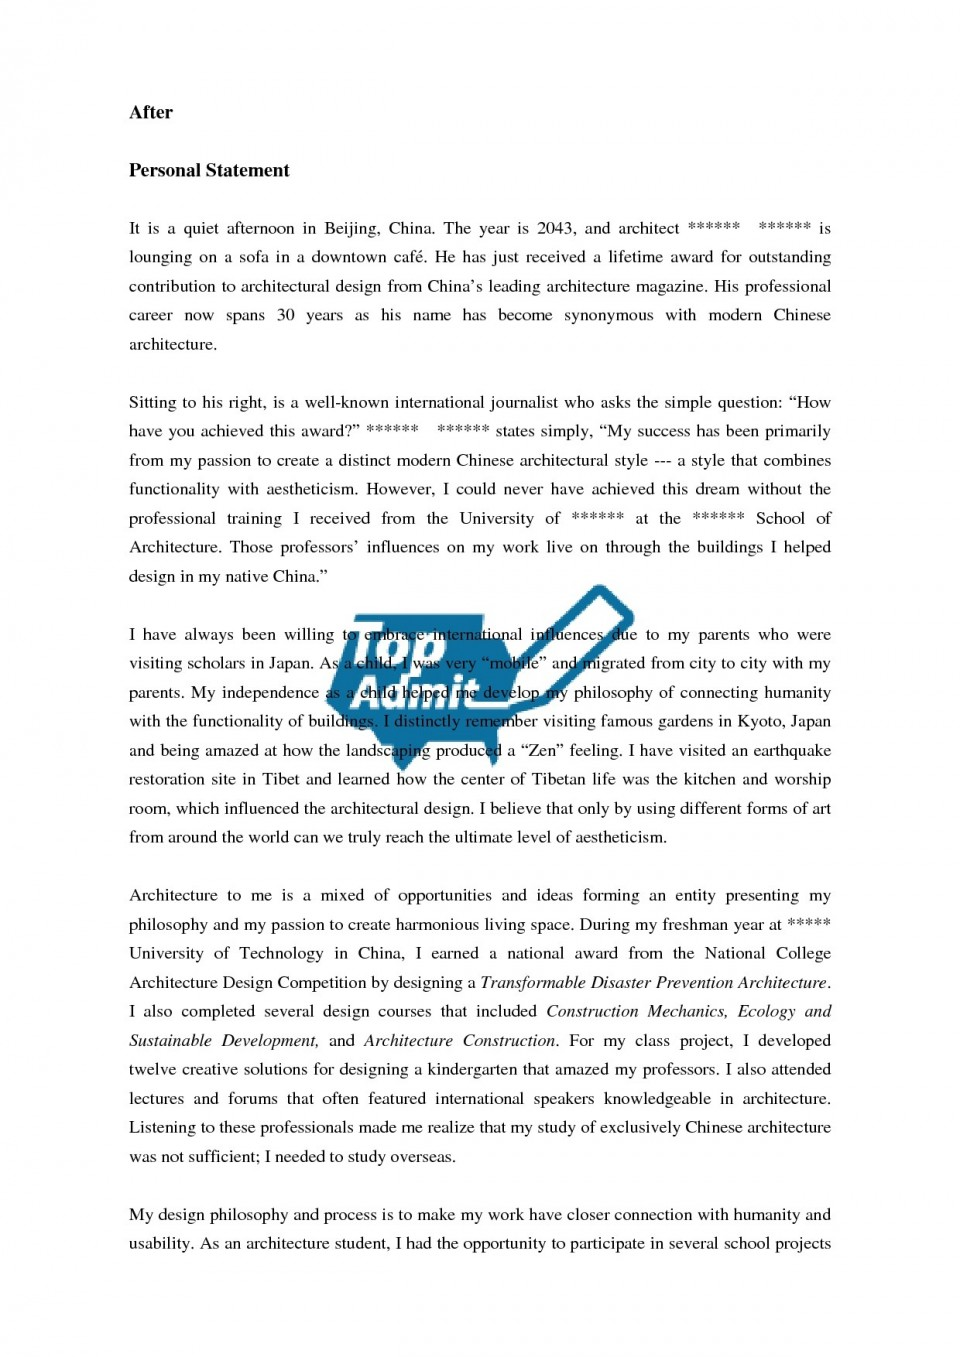 002 Zwjgmmd Stanford Application Essay Wonderful Mba Sample Help Tips 960